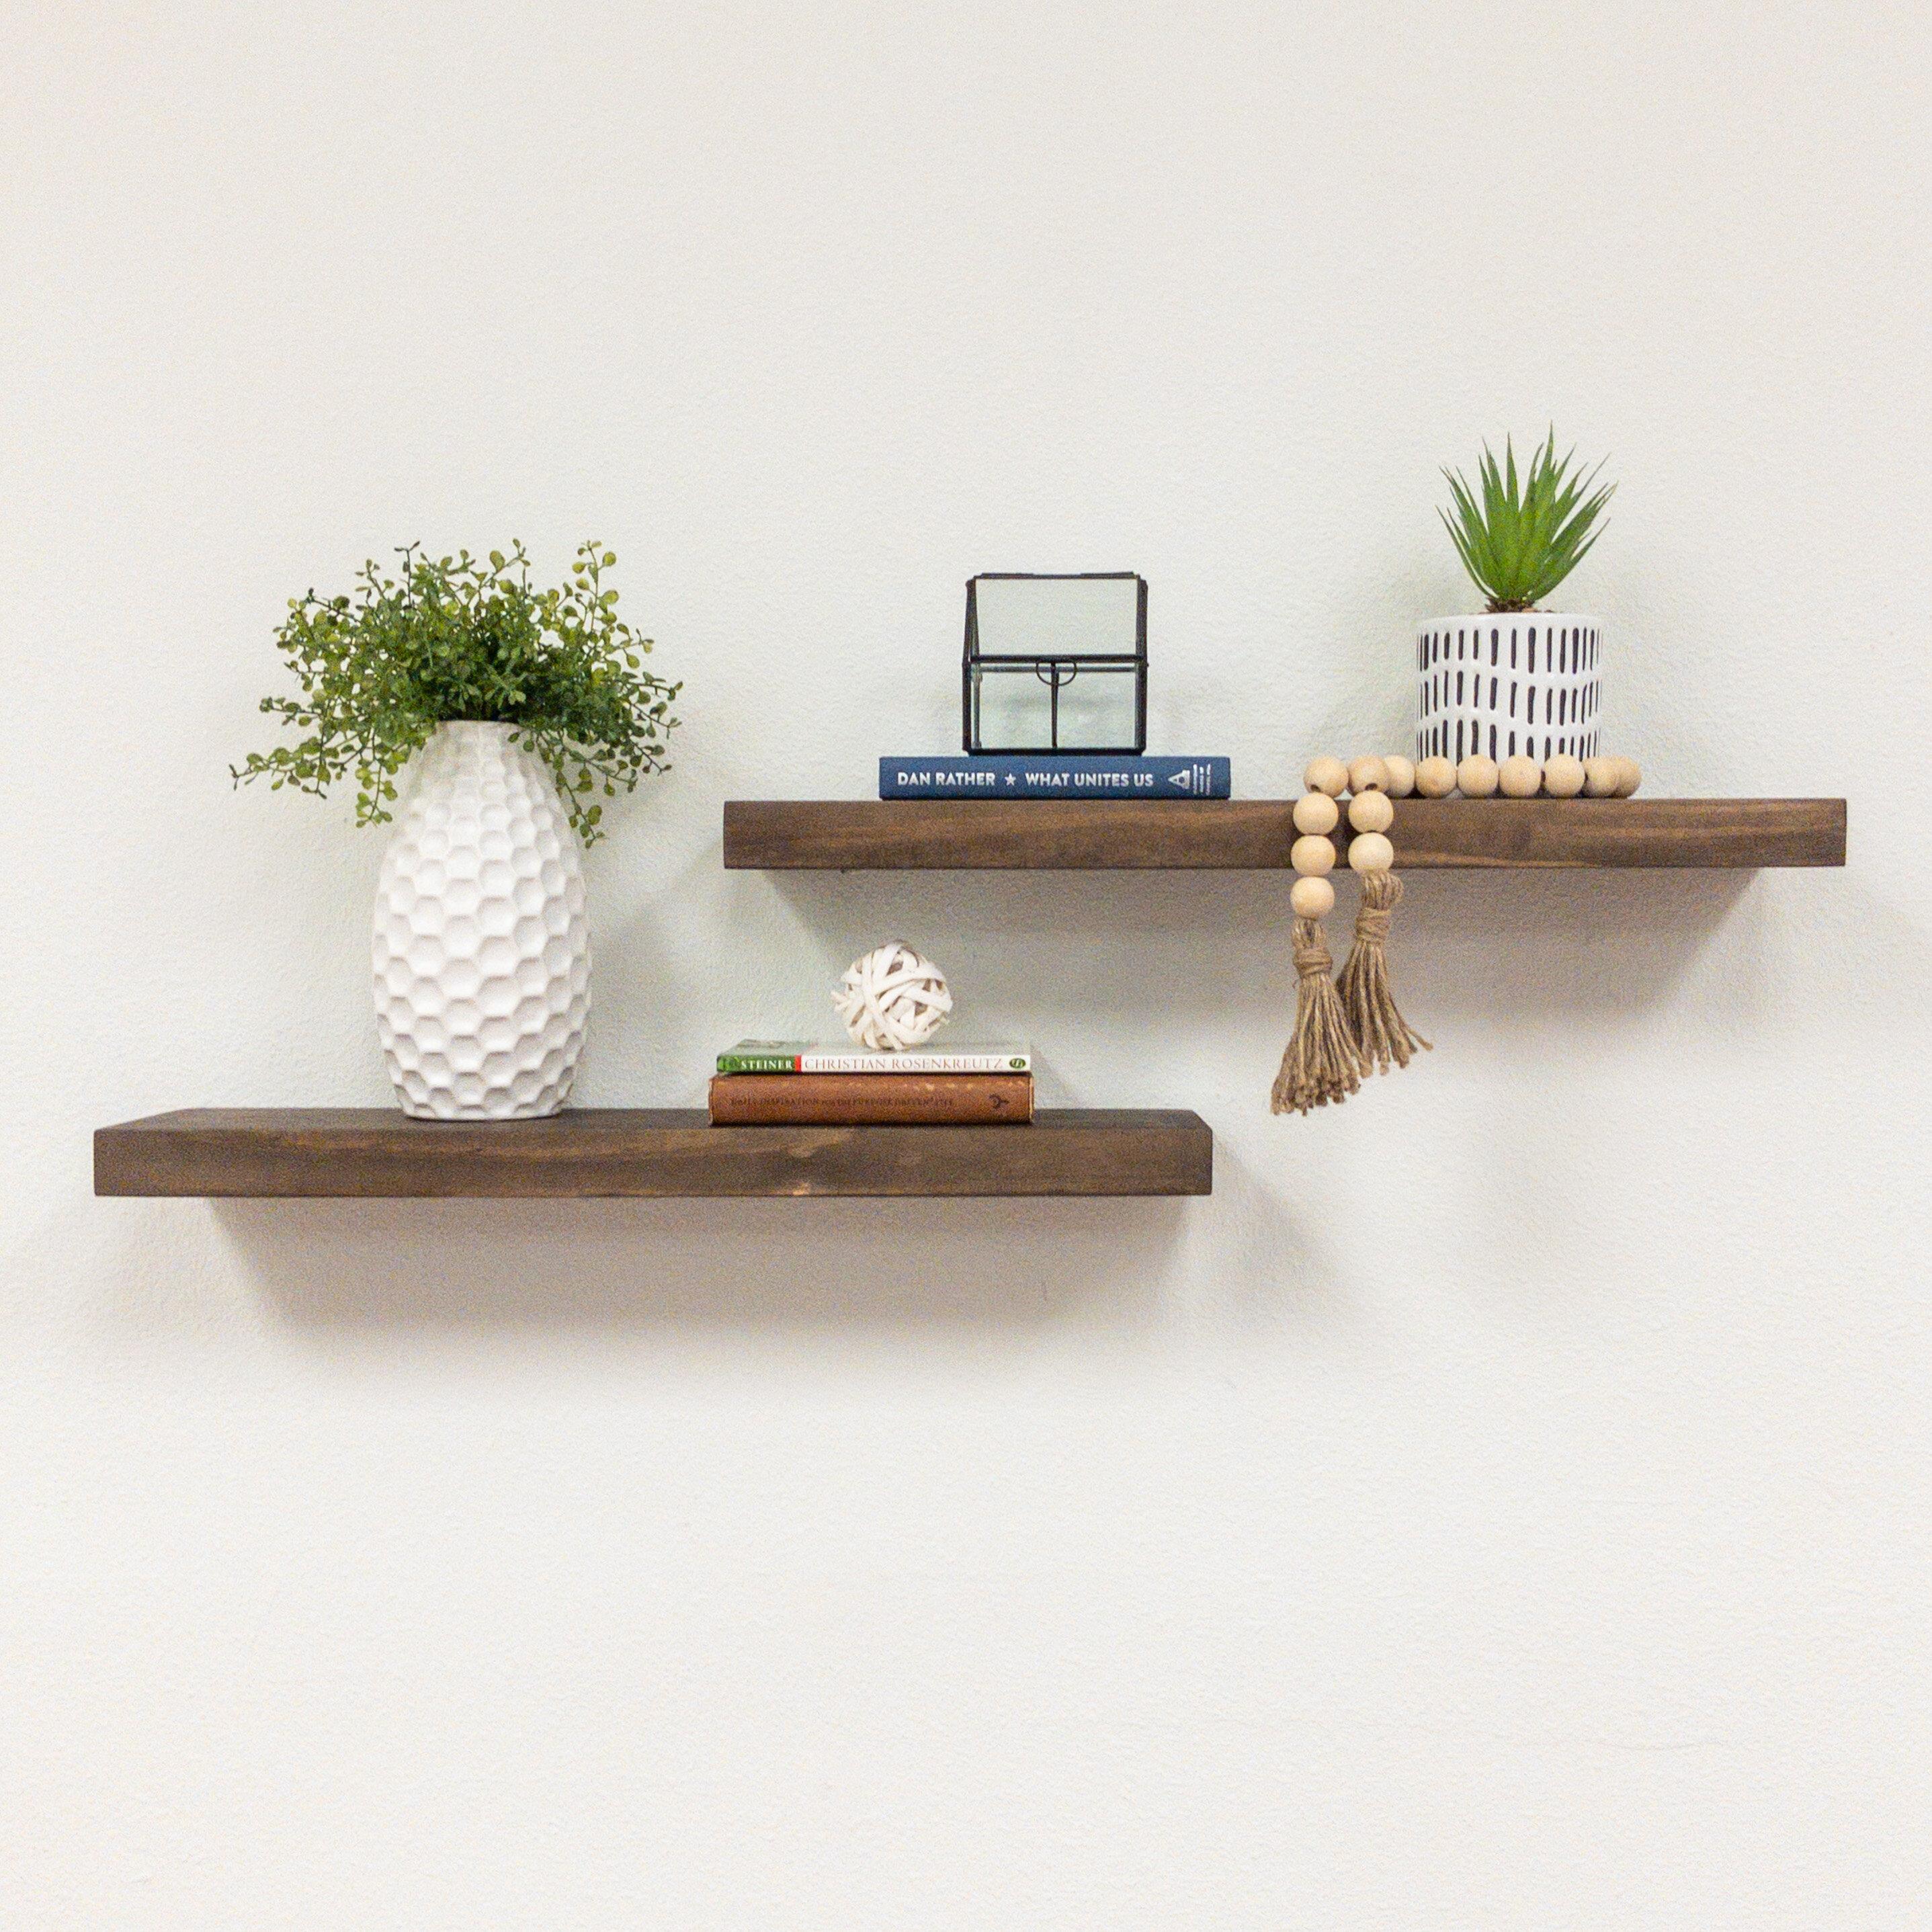 Evonne 2 Piece Pine Solid Wood Floating Shelf Reviews Birch Lane